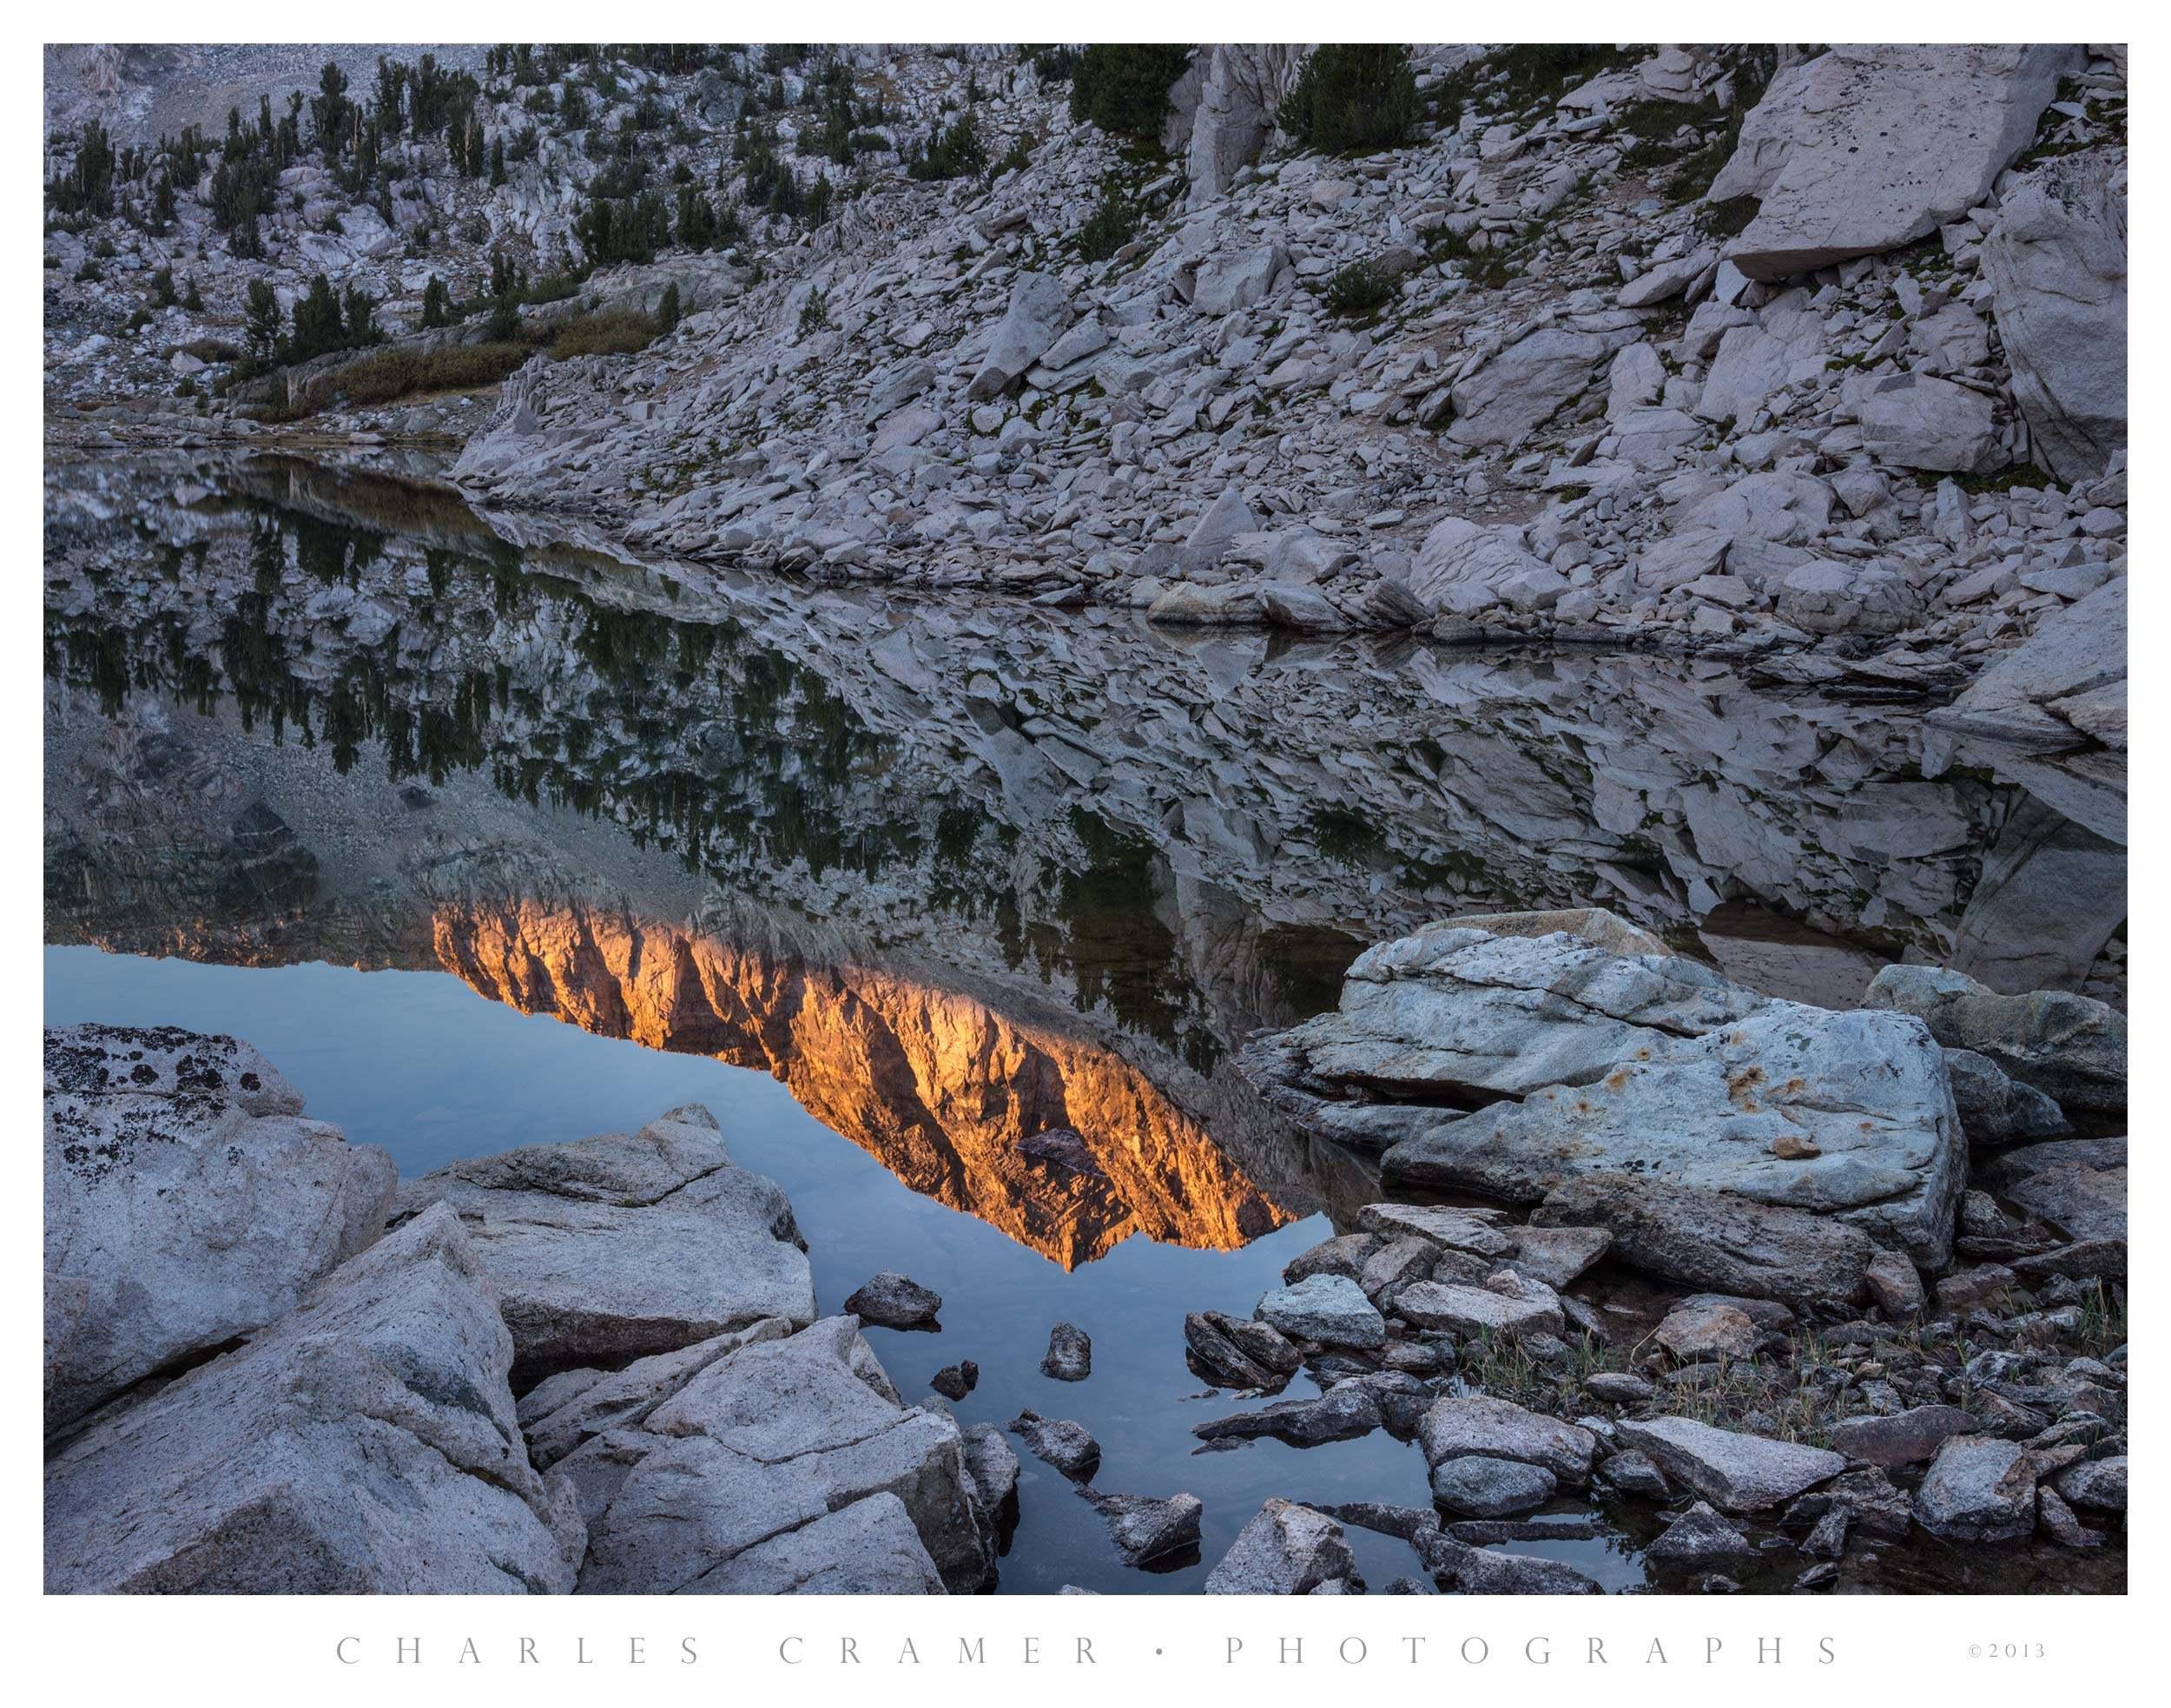 Pond at Sunrise, Sixty Lakes Basin, Kings Canyon